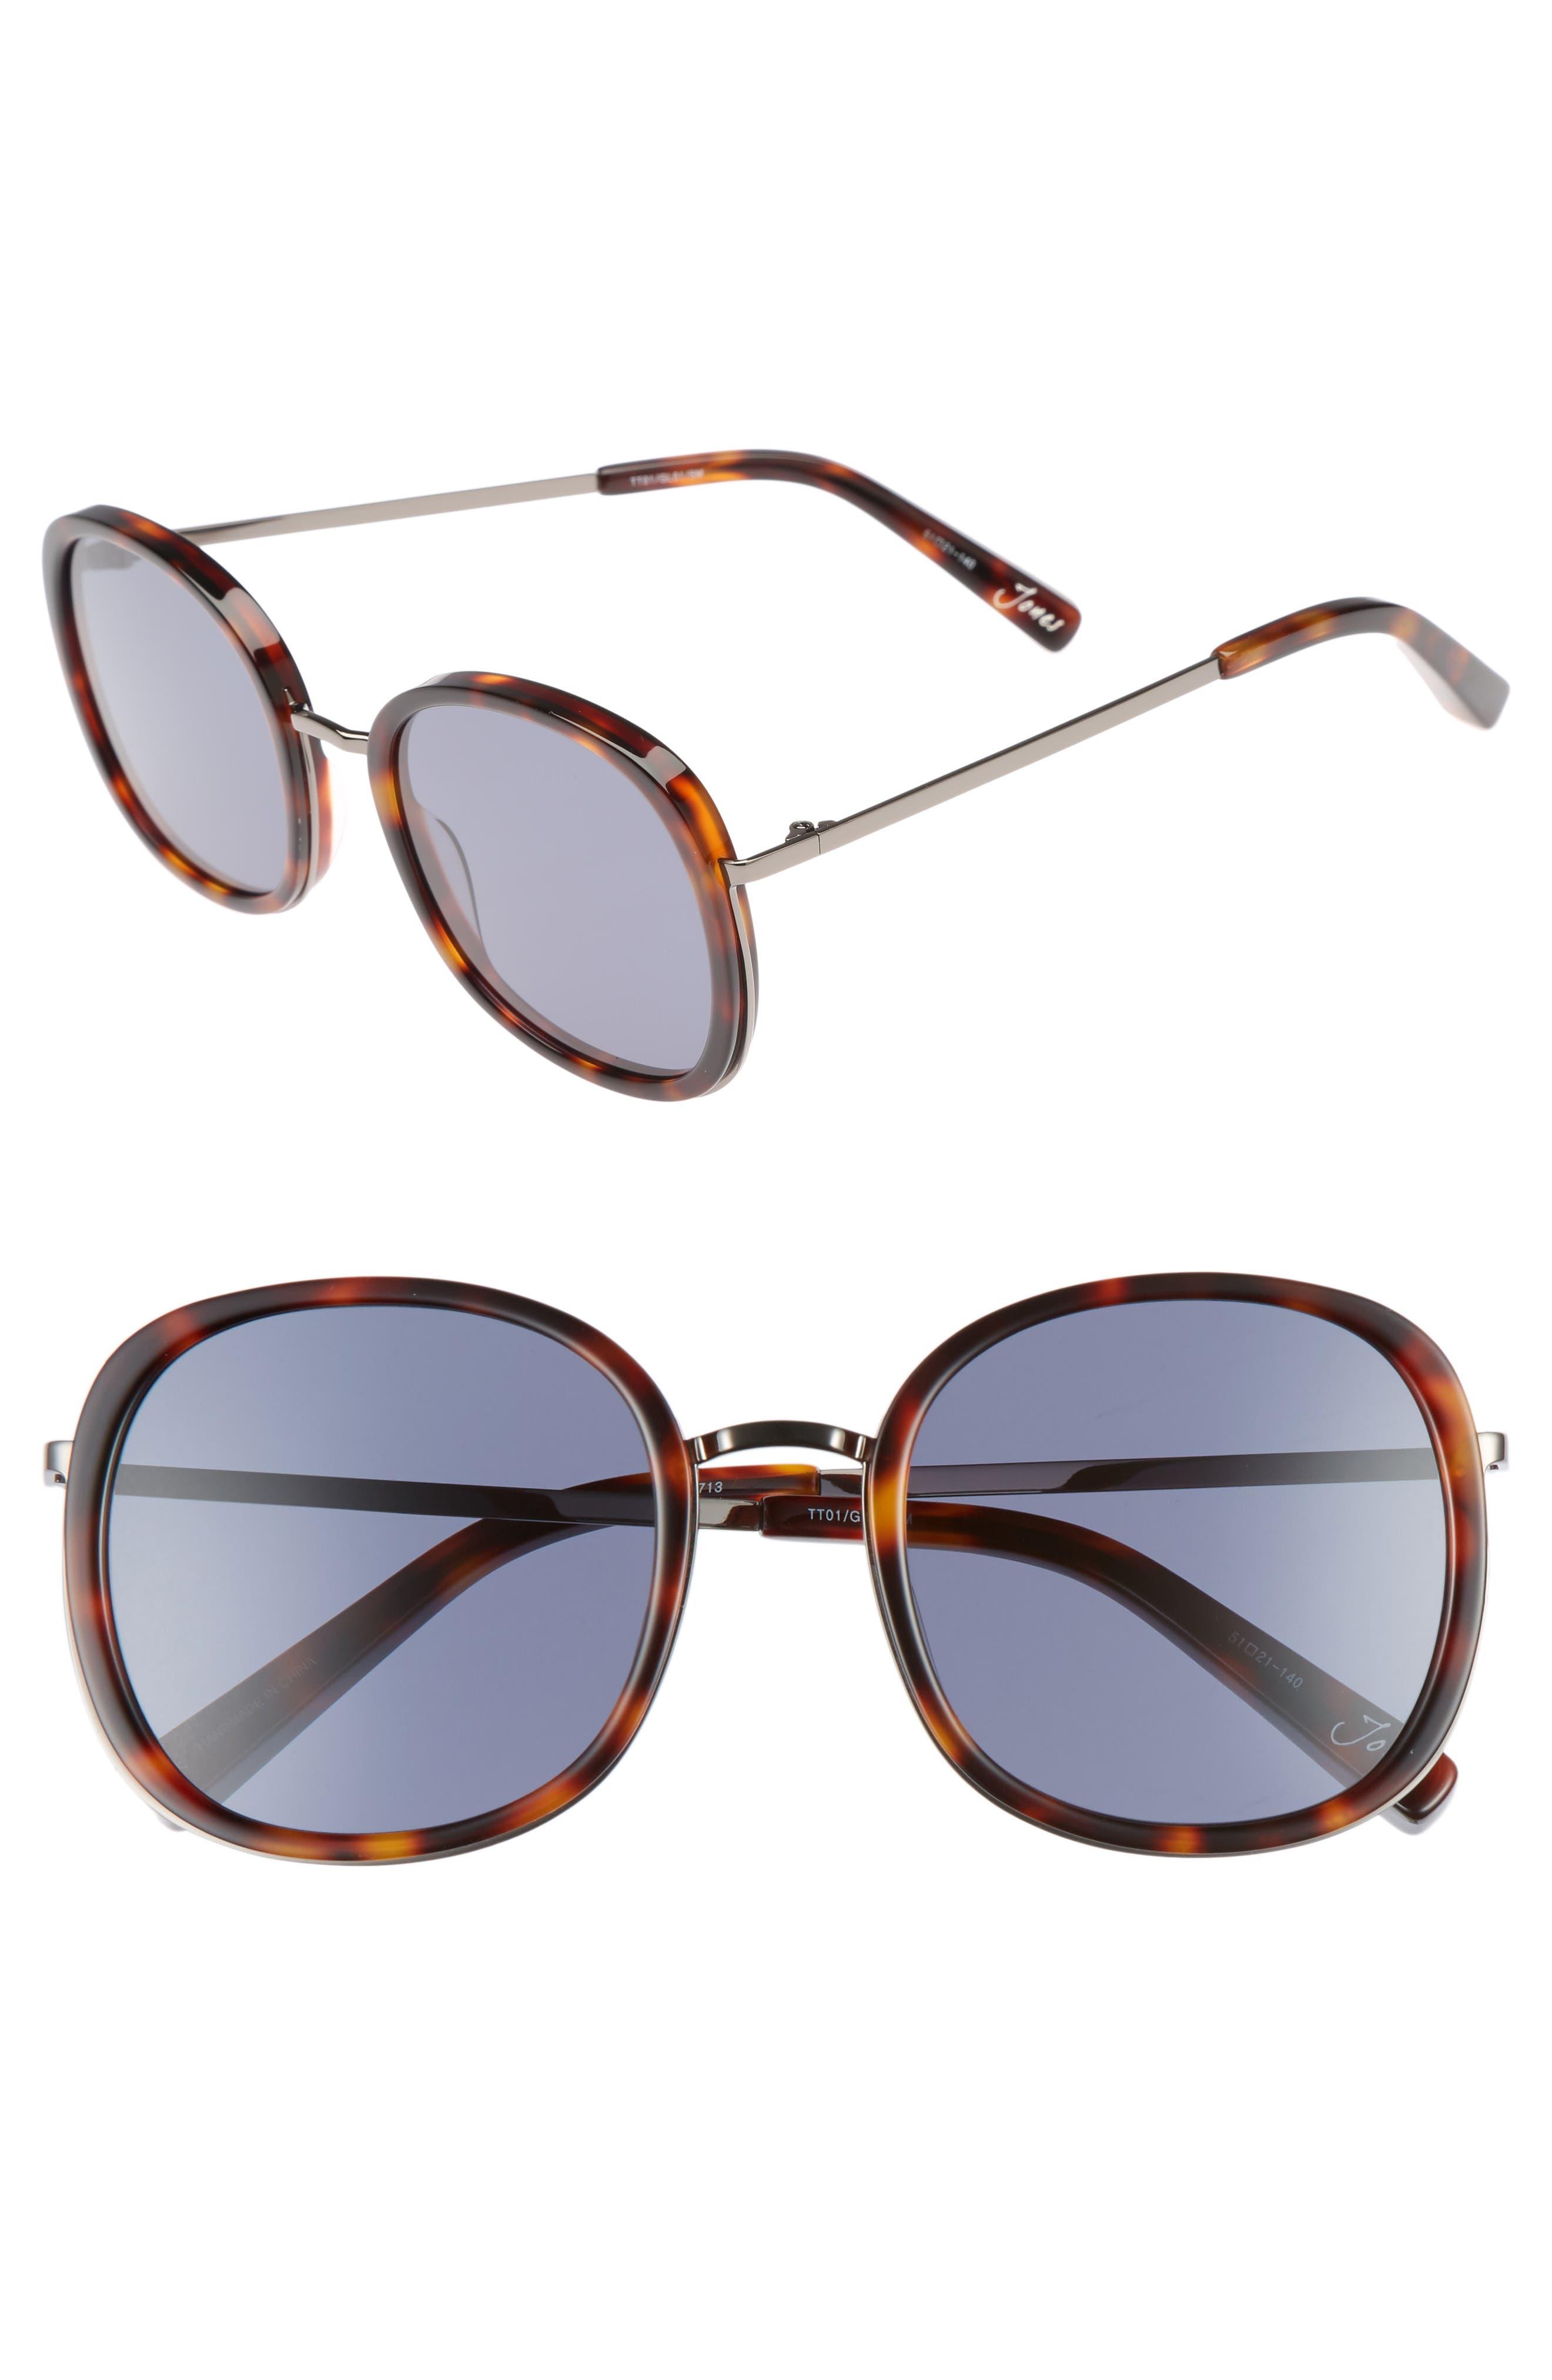 Main Image - Elizabeth and James Jones 51mm Round Sunglasses